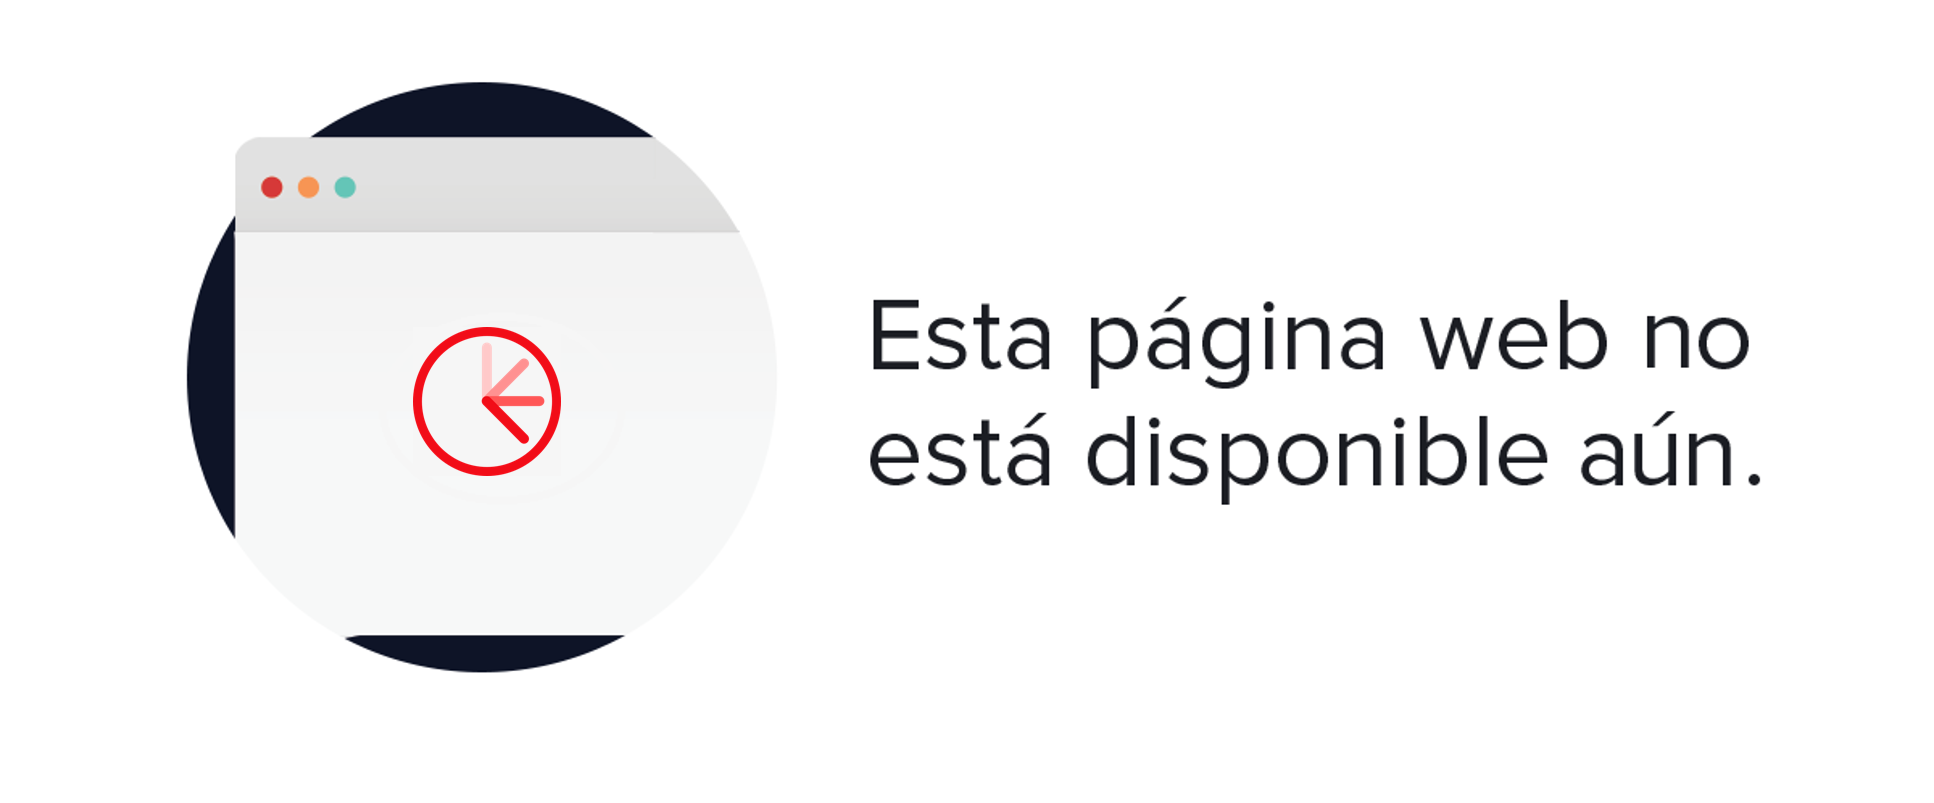 sale retailer 3ee1f ed9ca adidas greensider luz onyx oscuro plata metálico running blanco ESrc9o3  Córdoba Compra